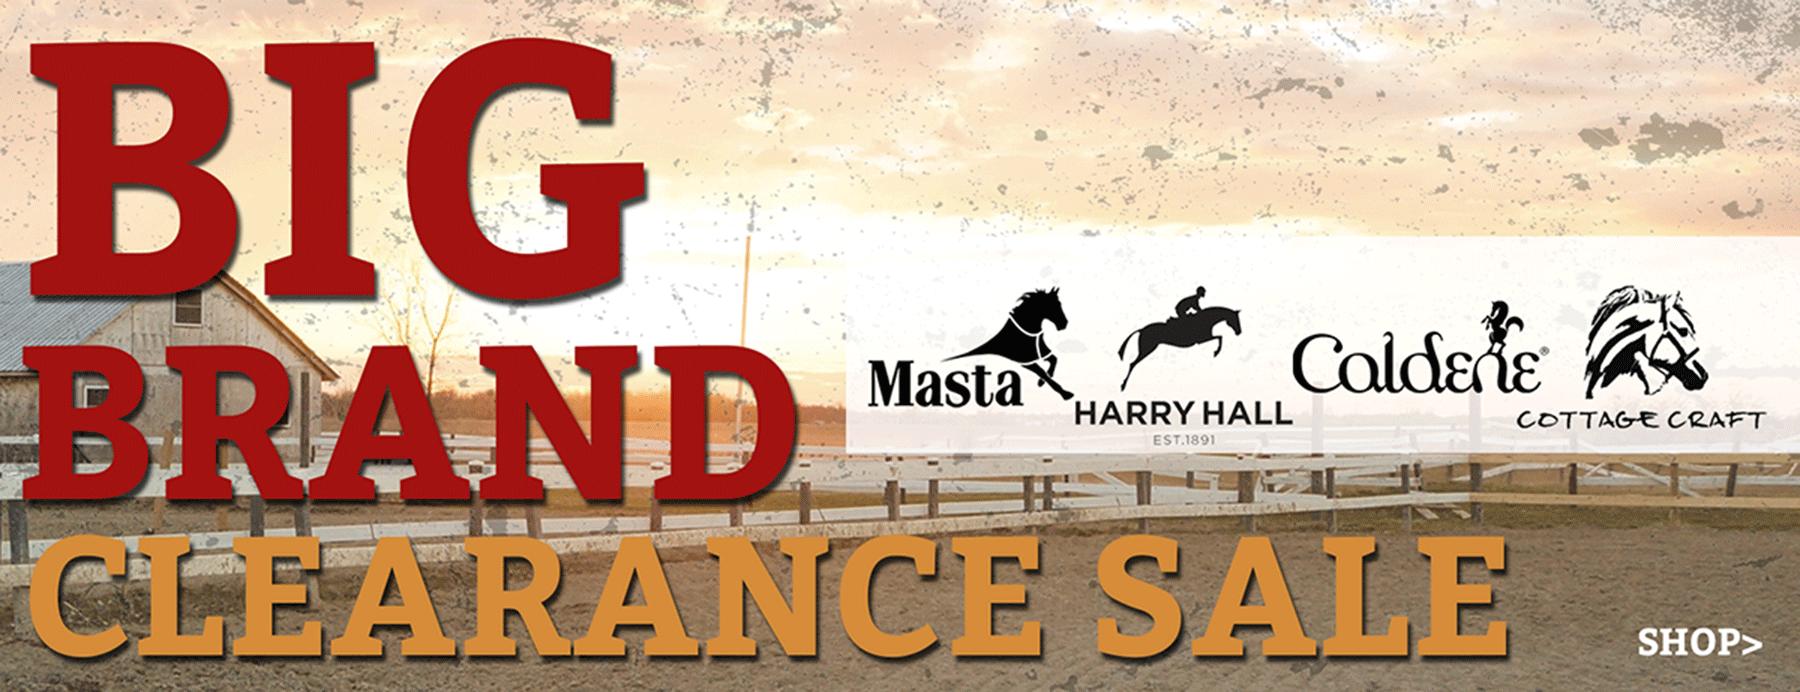 Big Brand Clearance Sale